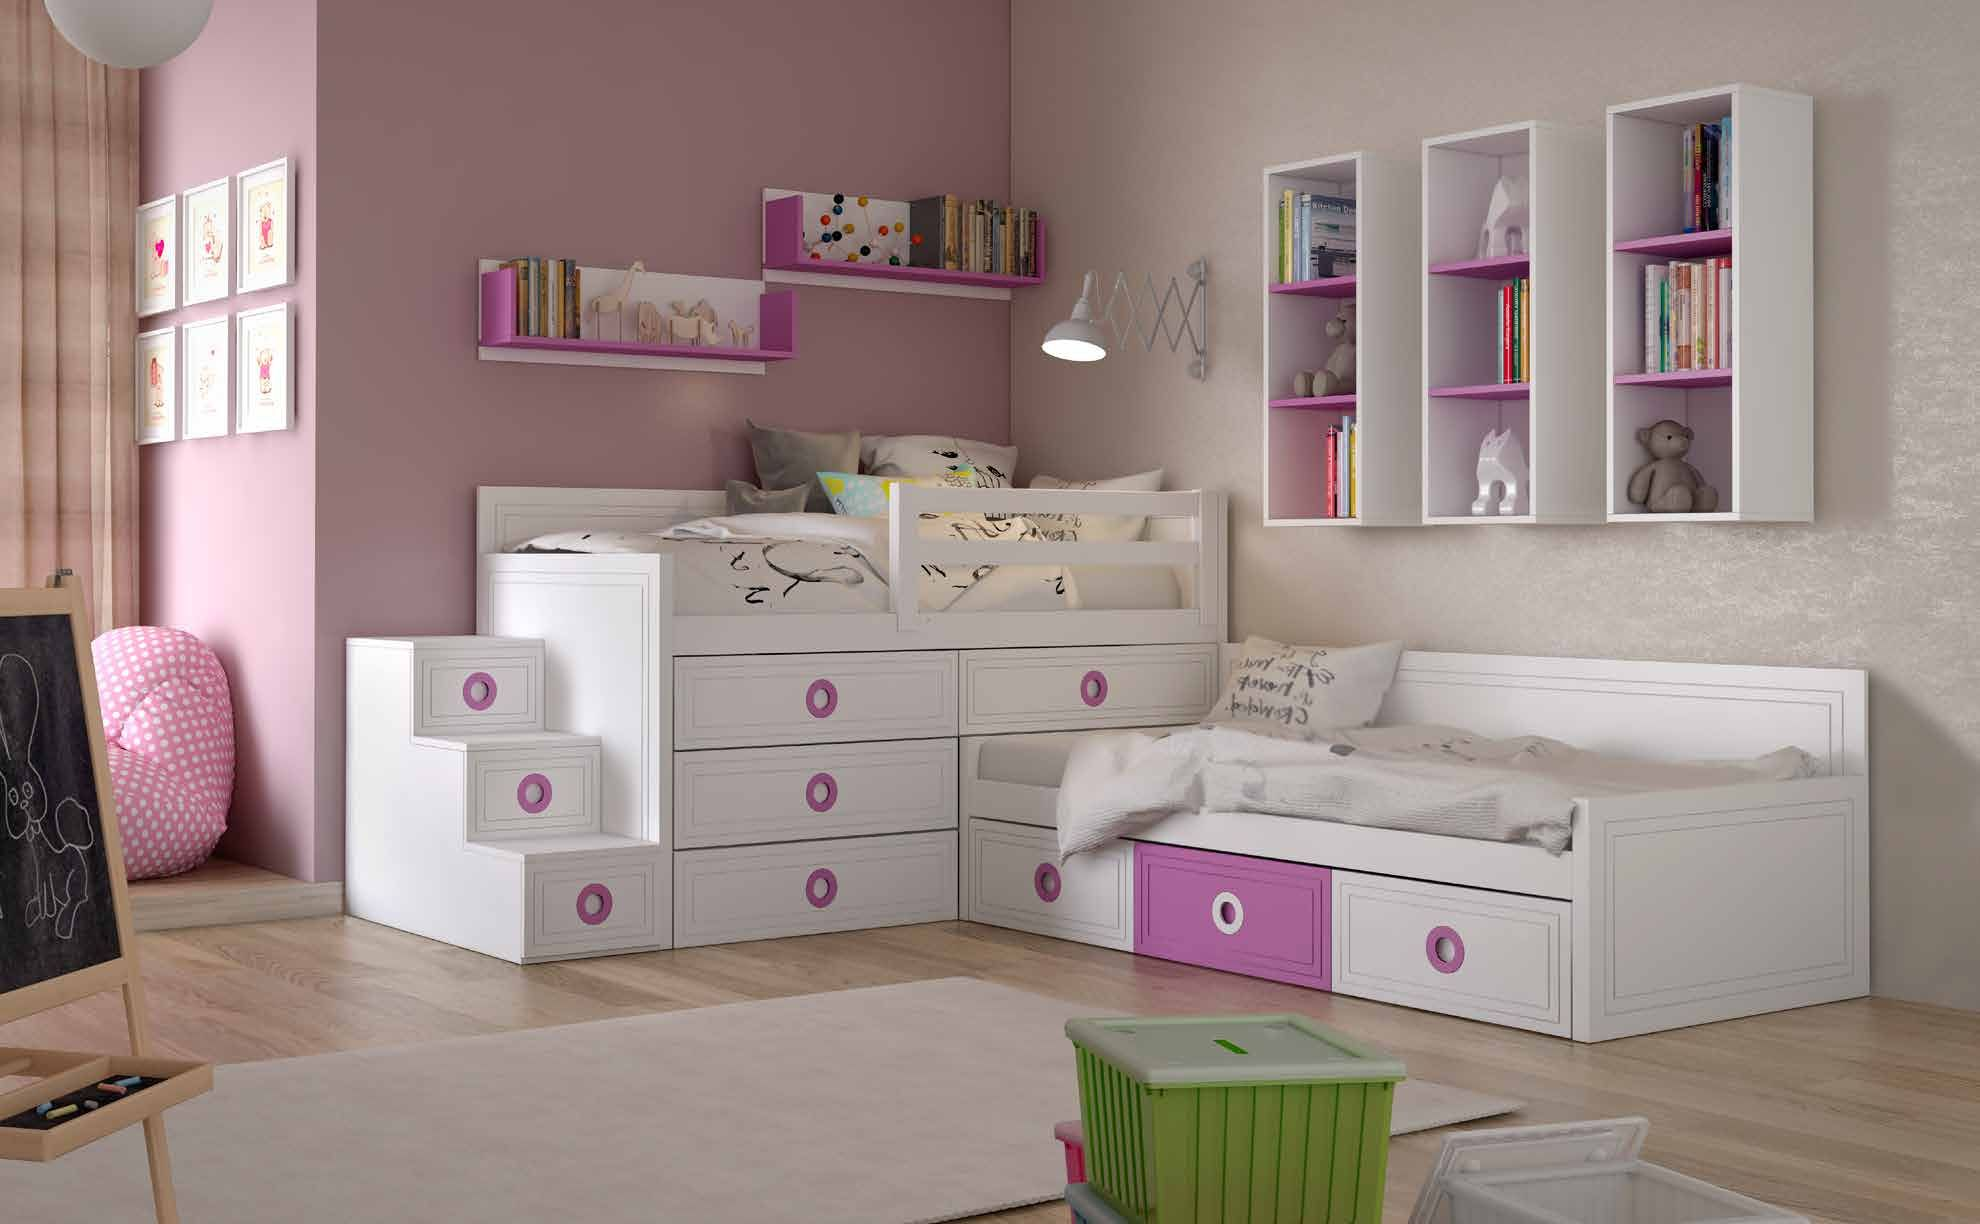 Dormitorio juvenil boreal 3 dlp mobiliario en 2019 dormitorios juveniles - Dormitorios juveniles minimalistas ...